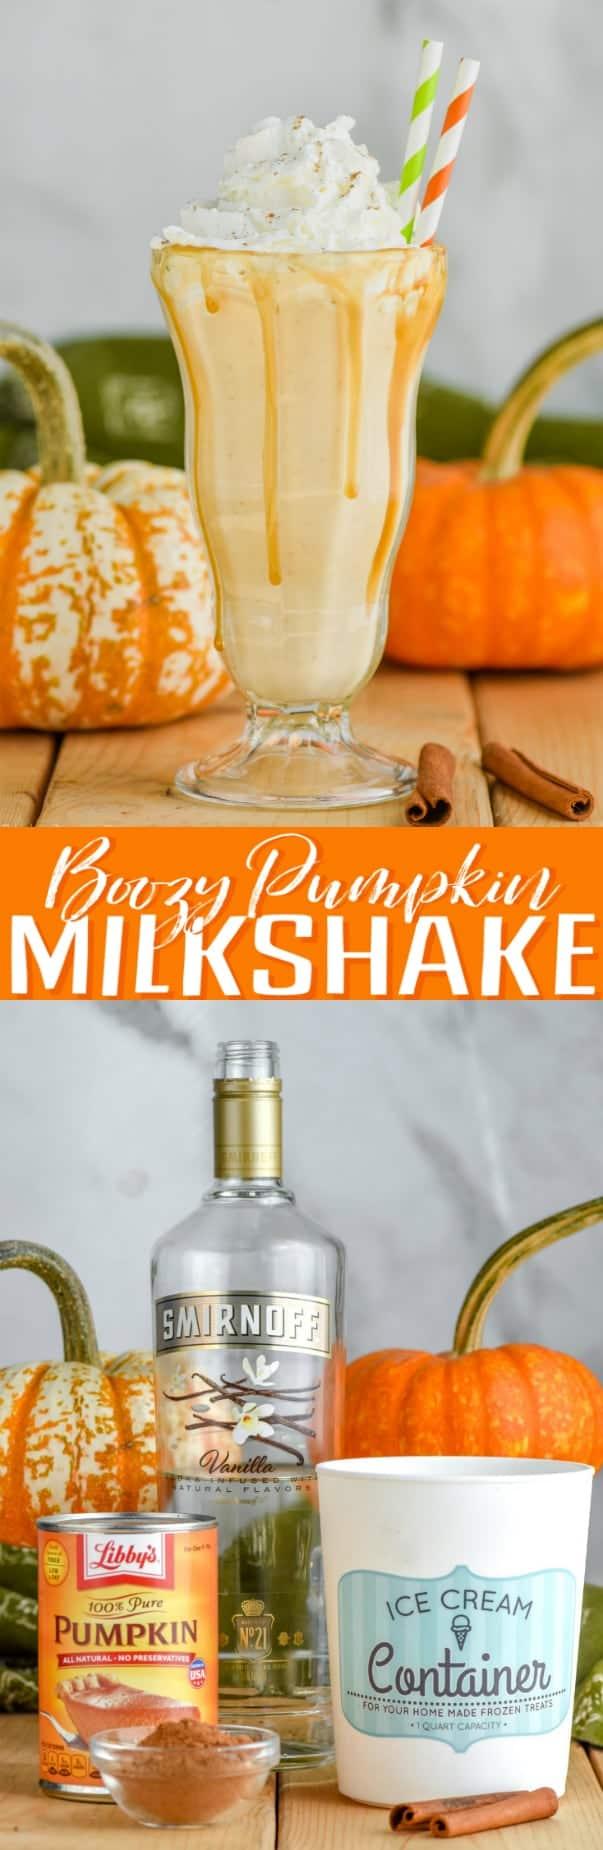 boozy pumpkin milkshake with whipped cream and straws